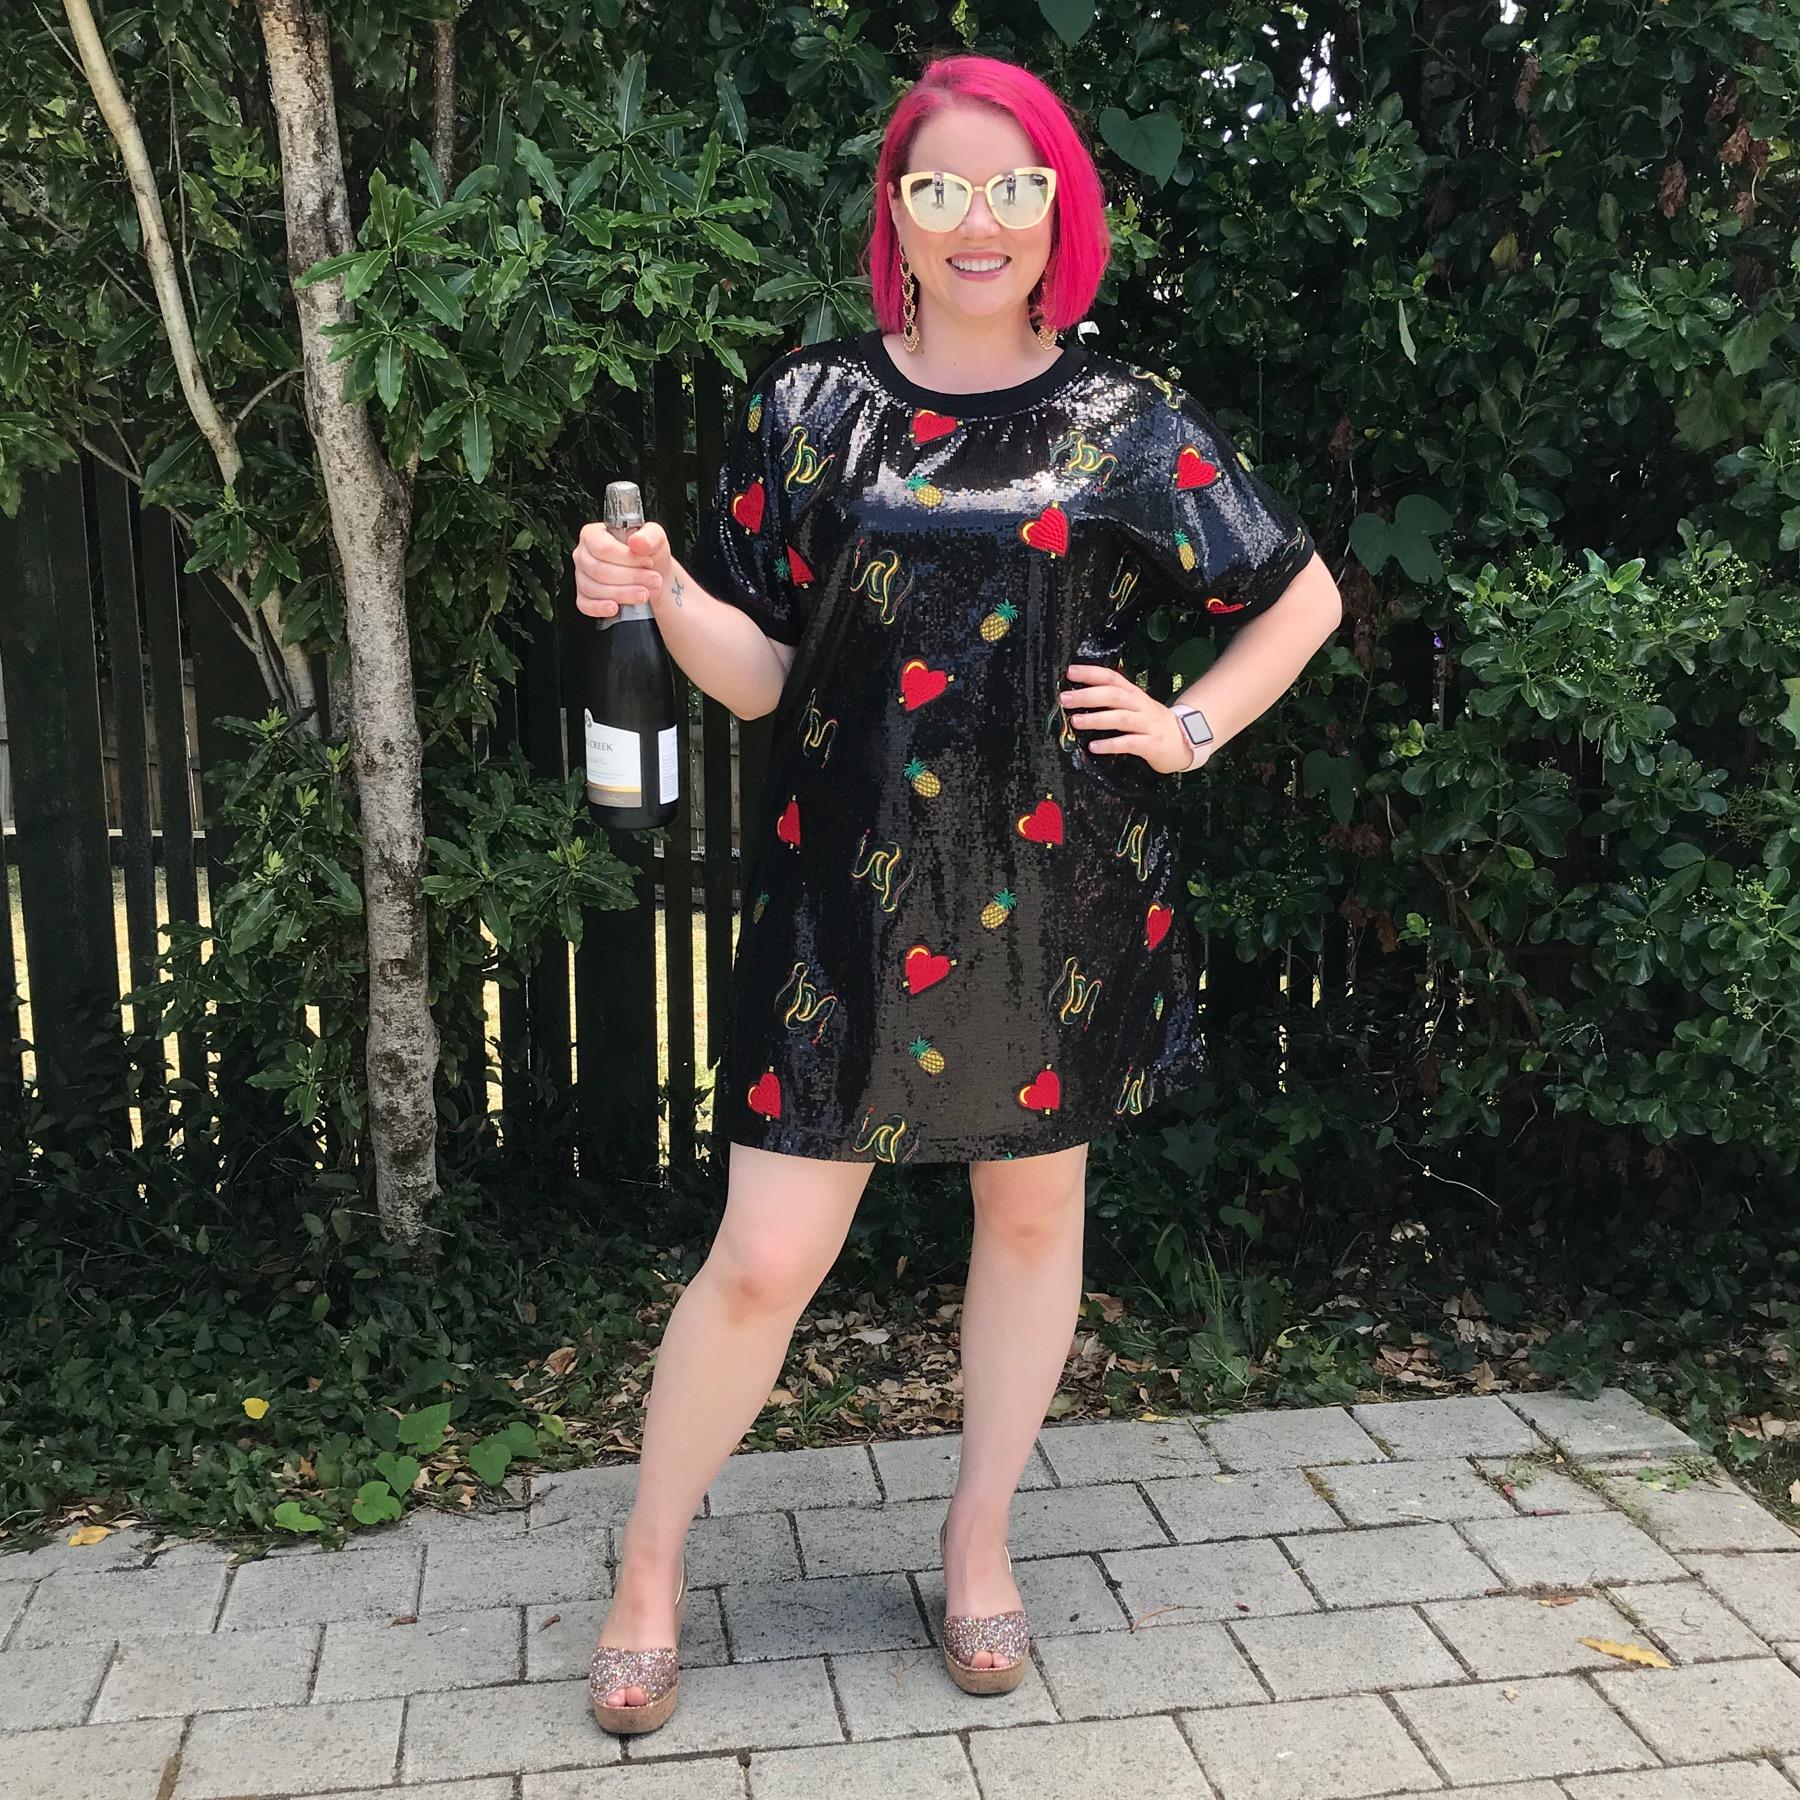 Coop dress, Lovelee Soles shoes, Quay sunglasses.